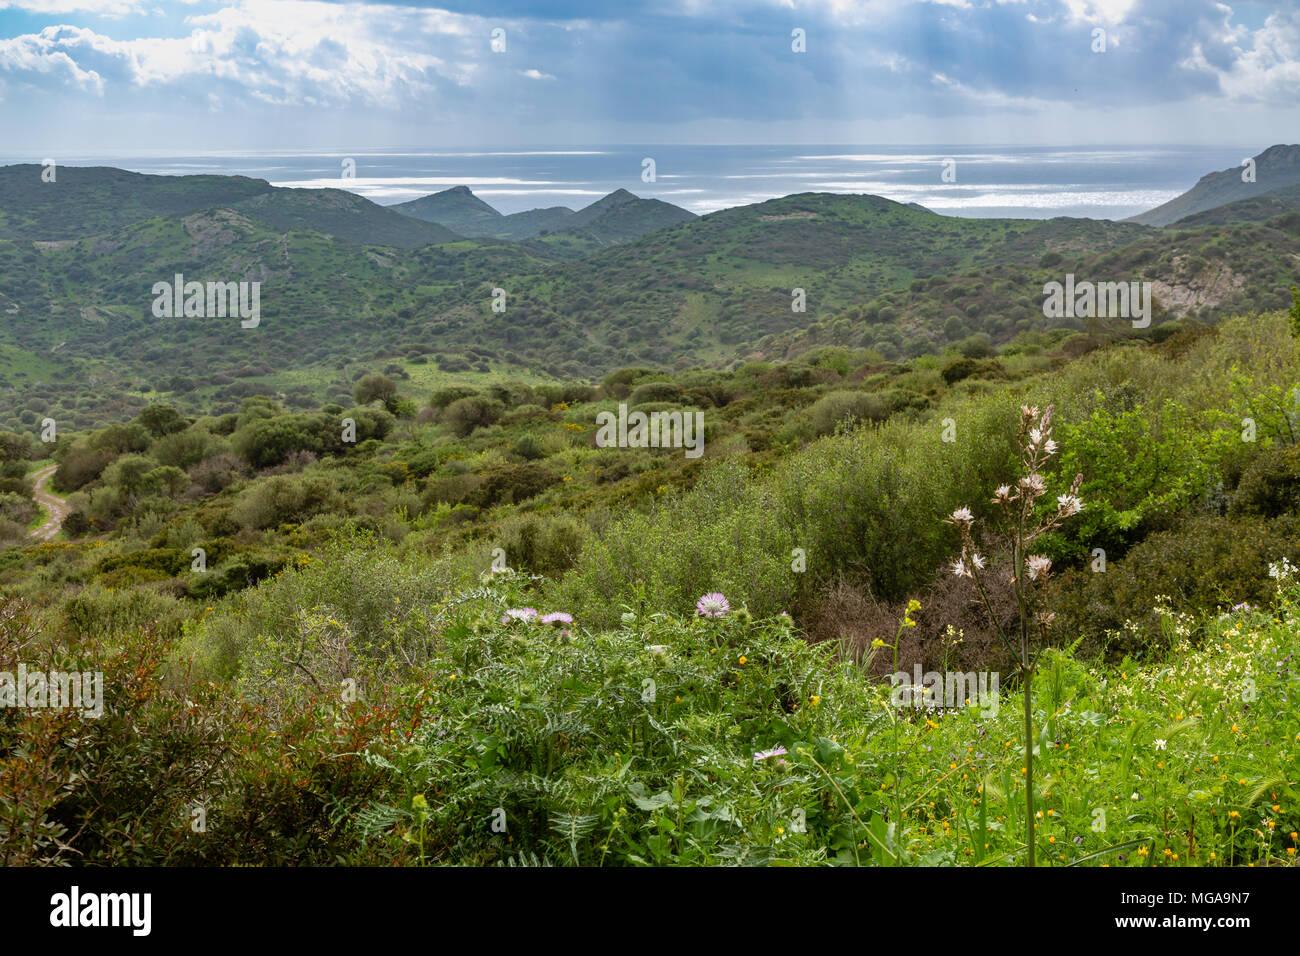 The spring atmosphere of the northwest coast of Sardinia, Italy - Stock Image